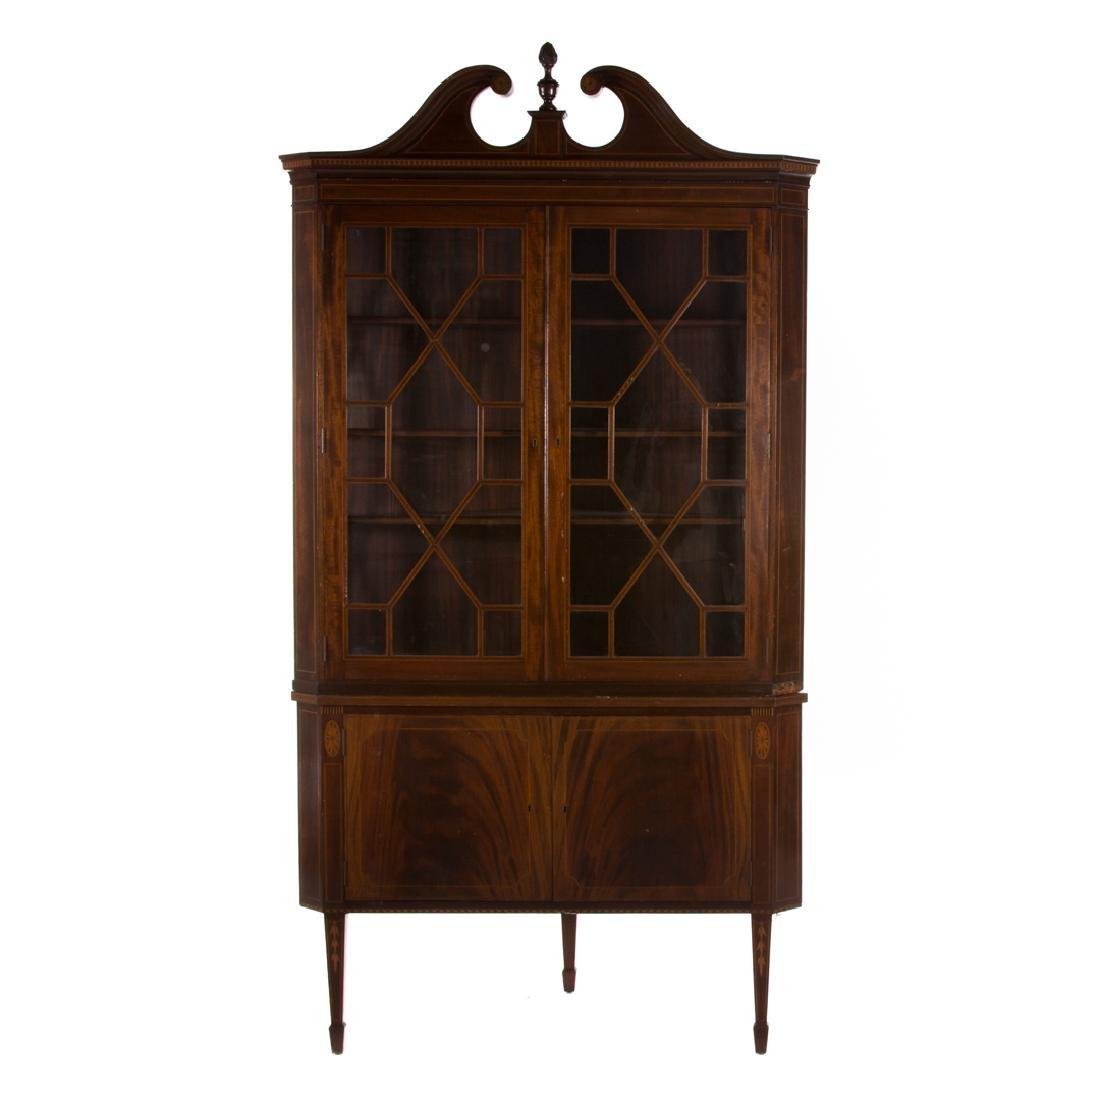 Potthast Federal style mahogany corner cabinet